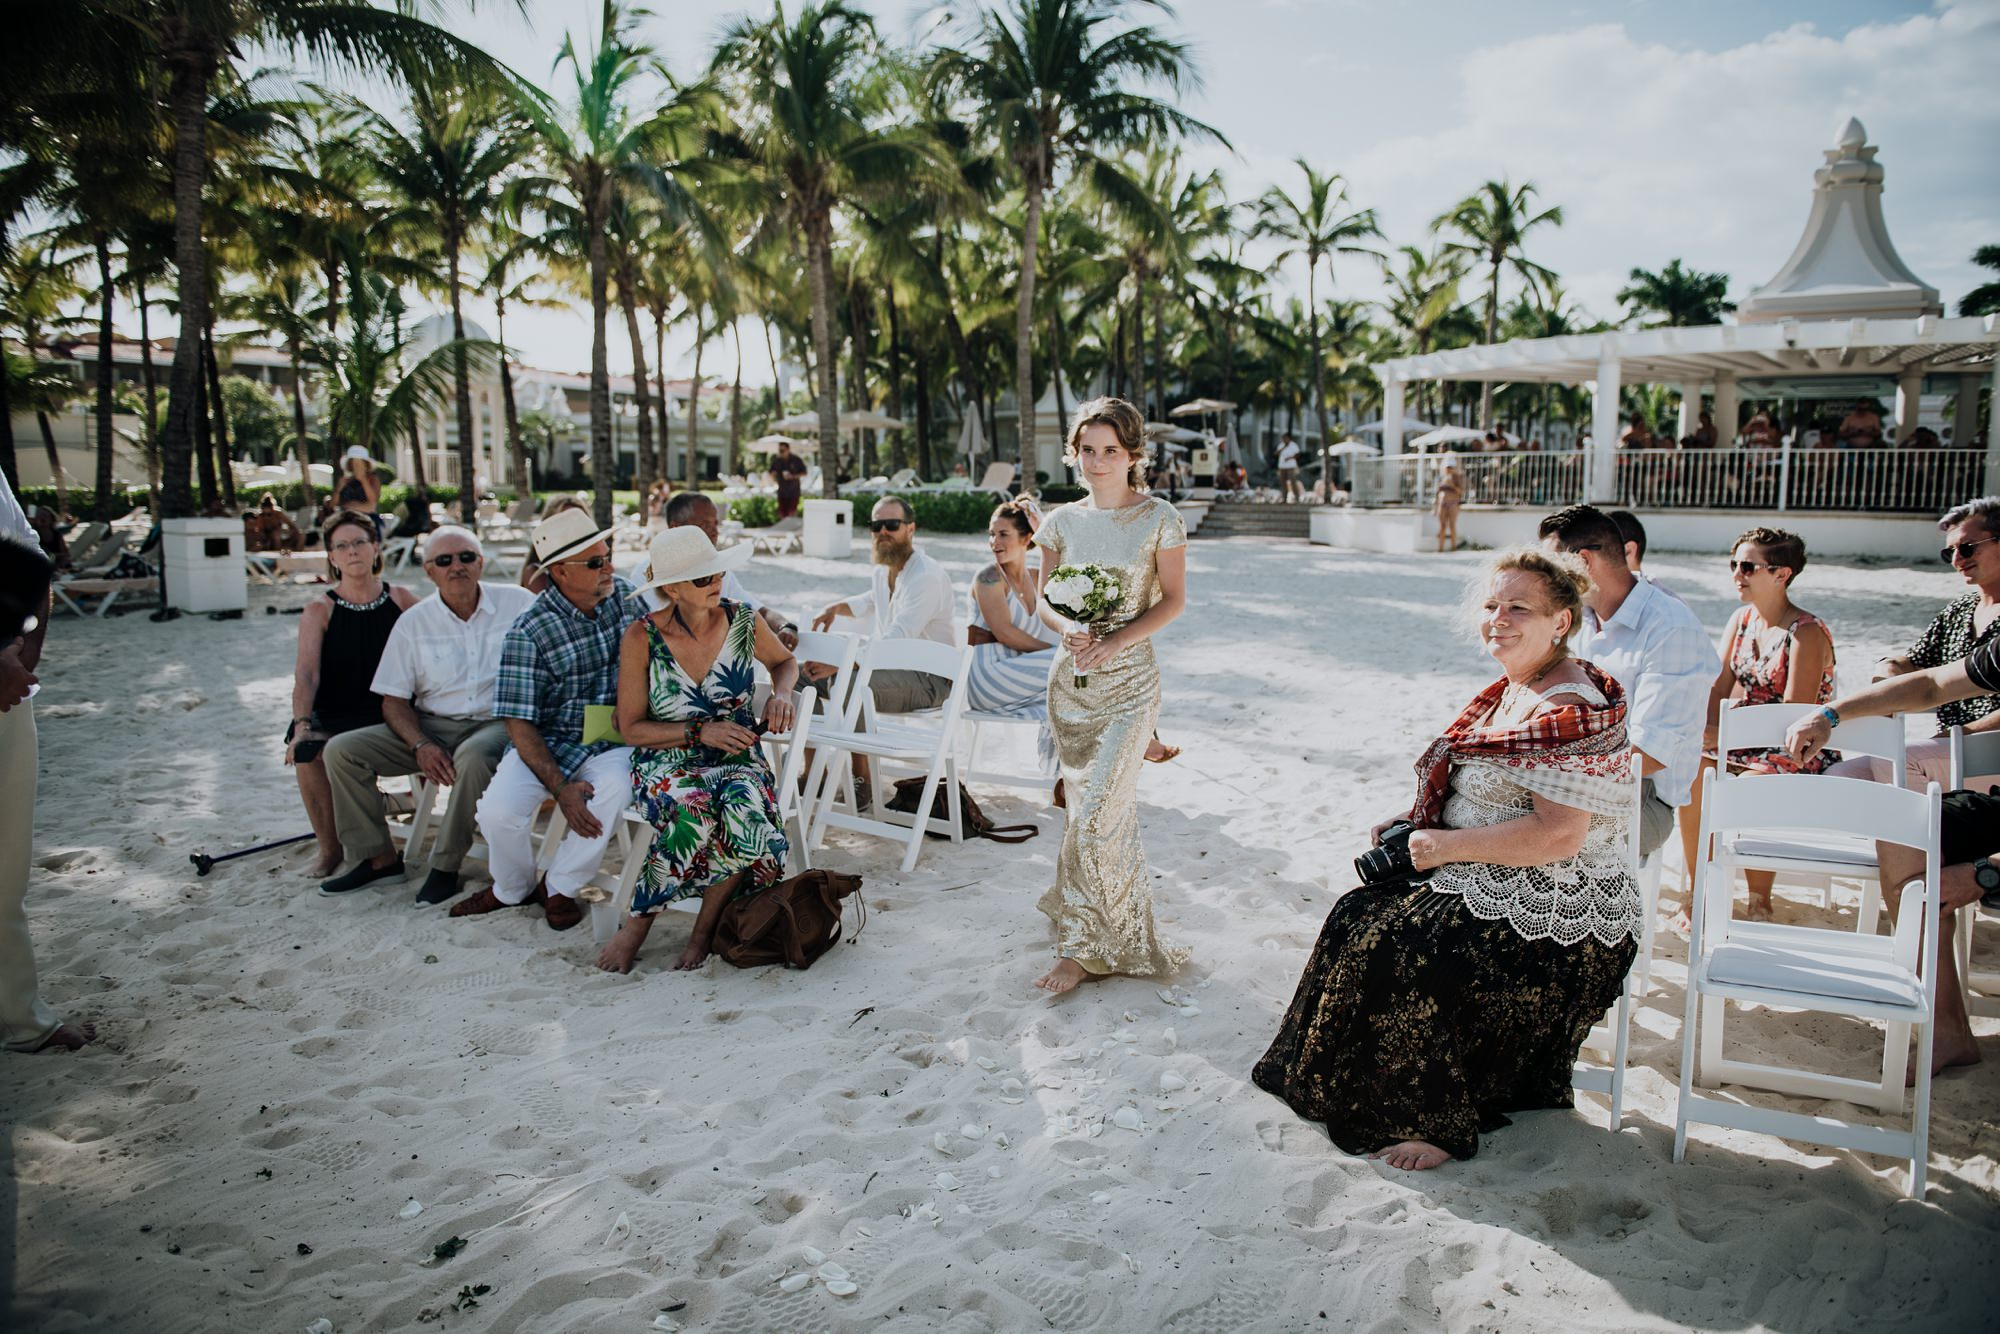 bridesmaid walking into wedding ceremony on beach